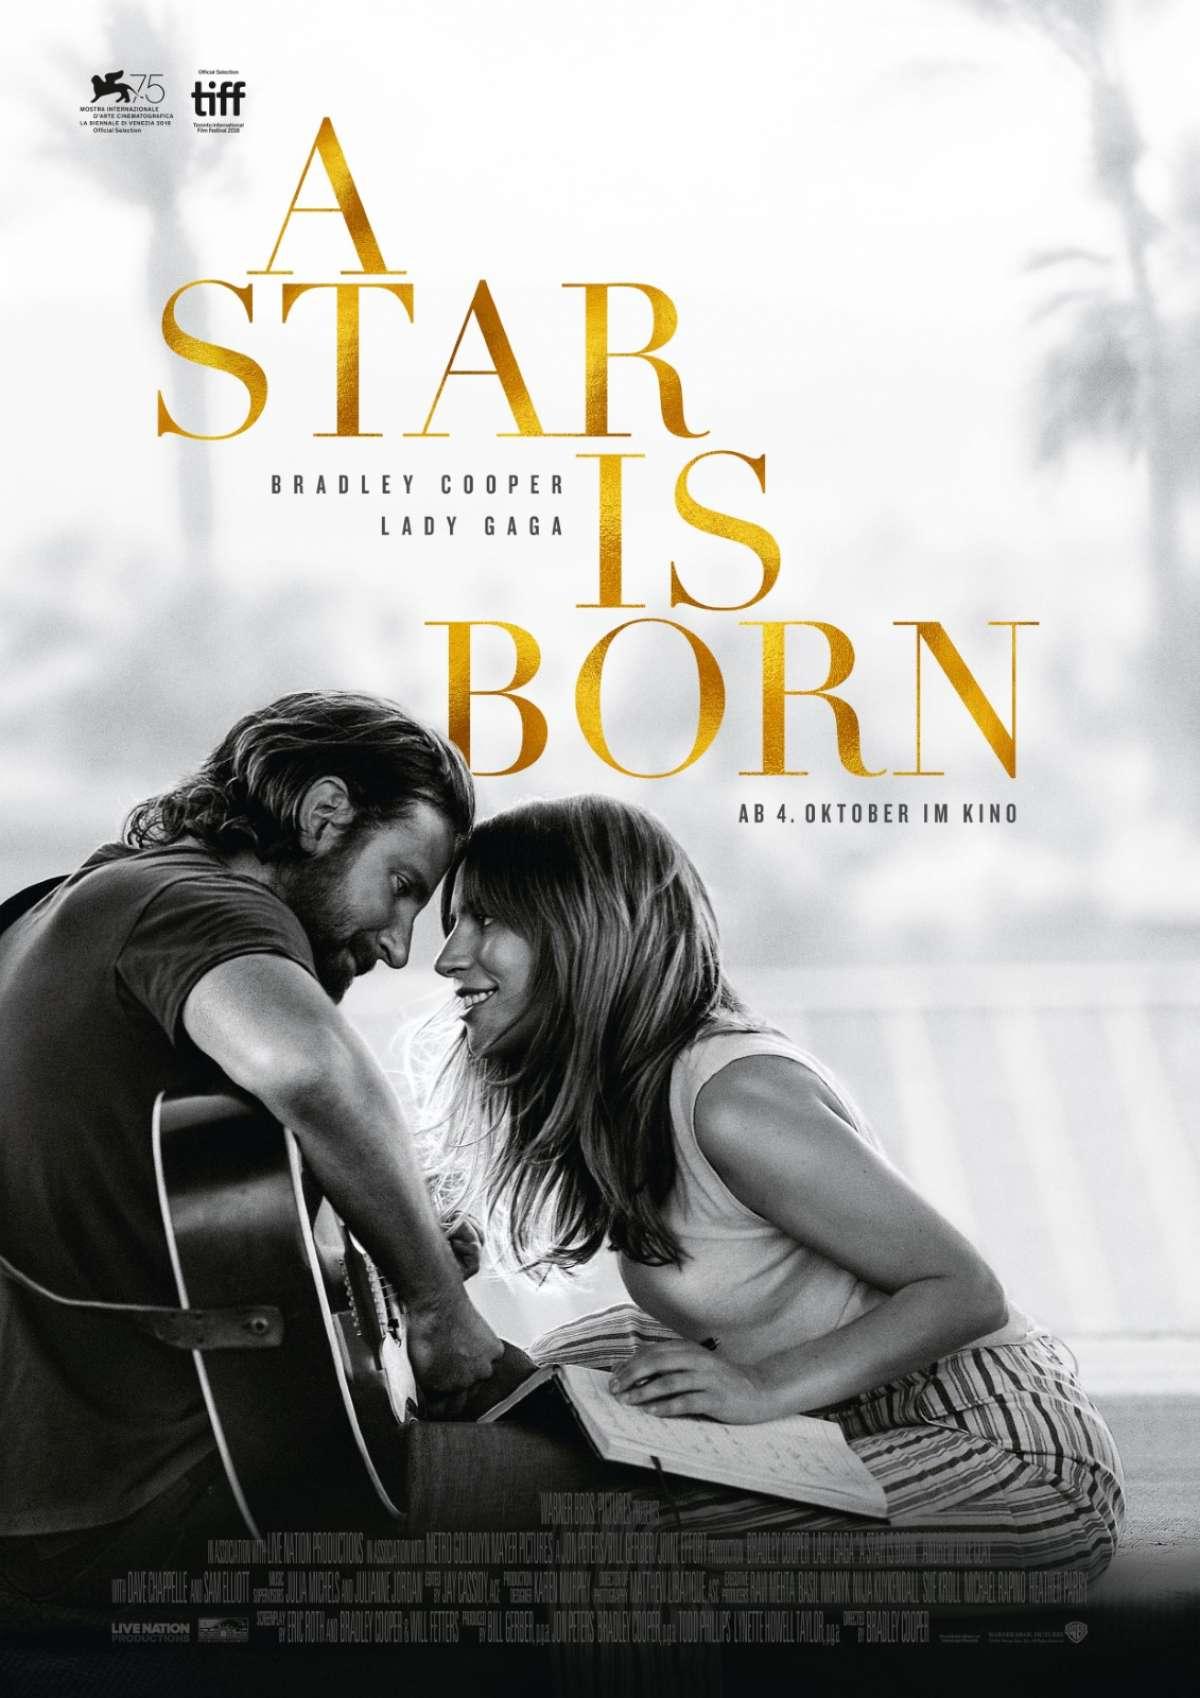 A Star is Born - Autokino  - Open Air Arena - Homberg (Efze)